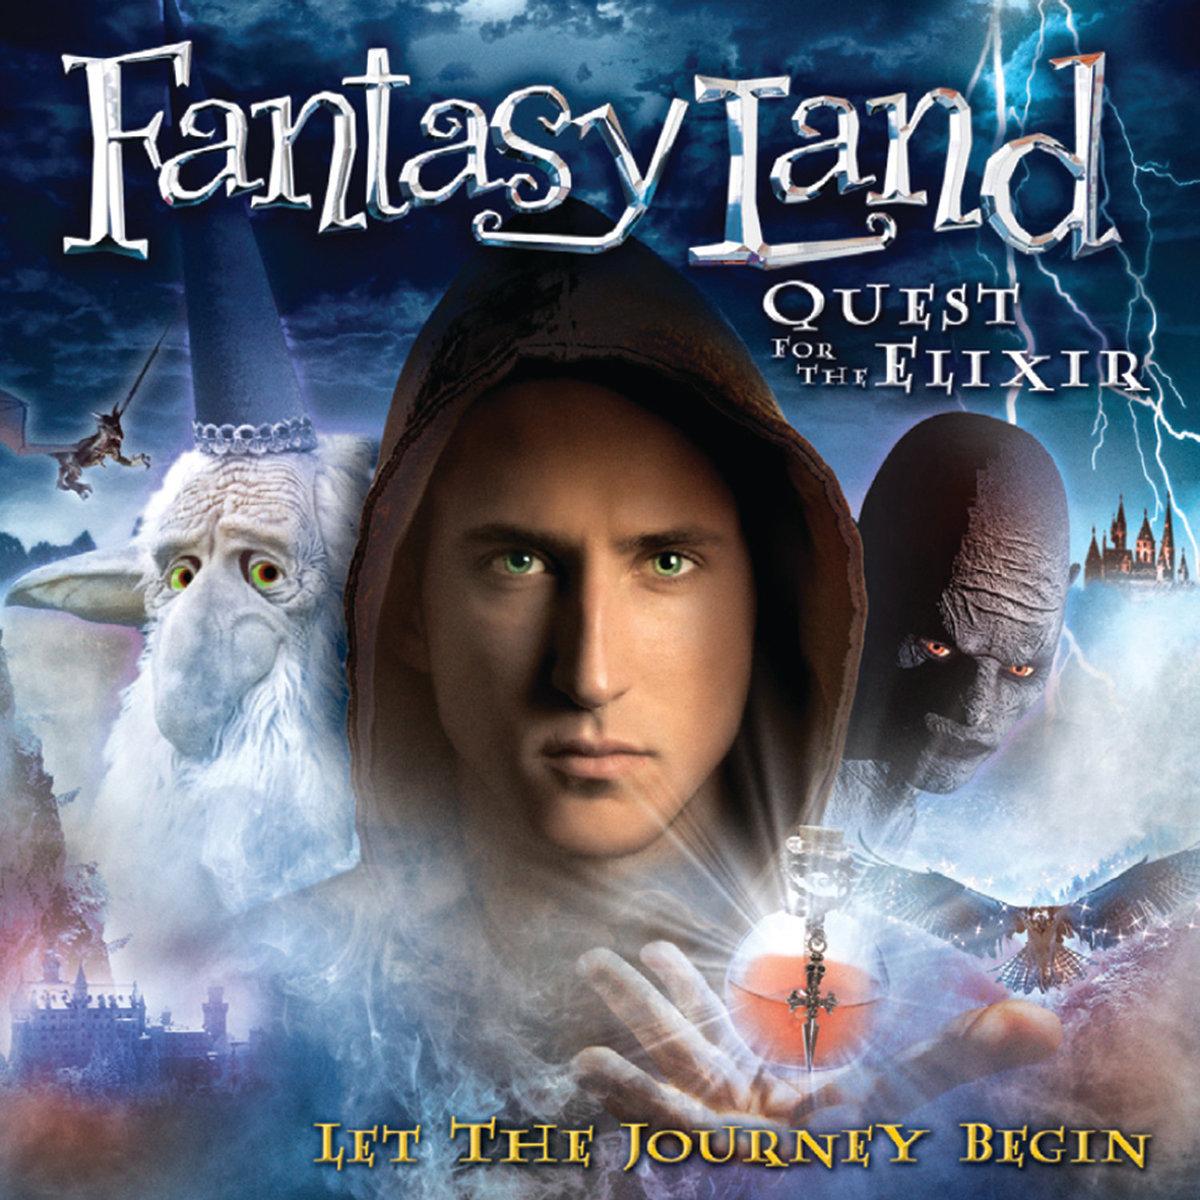 Fantasy Land: Quest for the Elixir